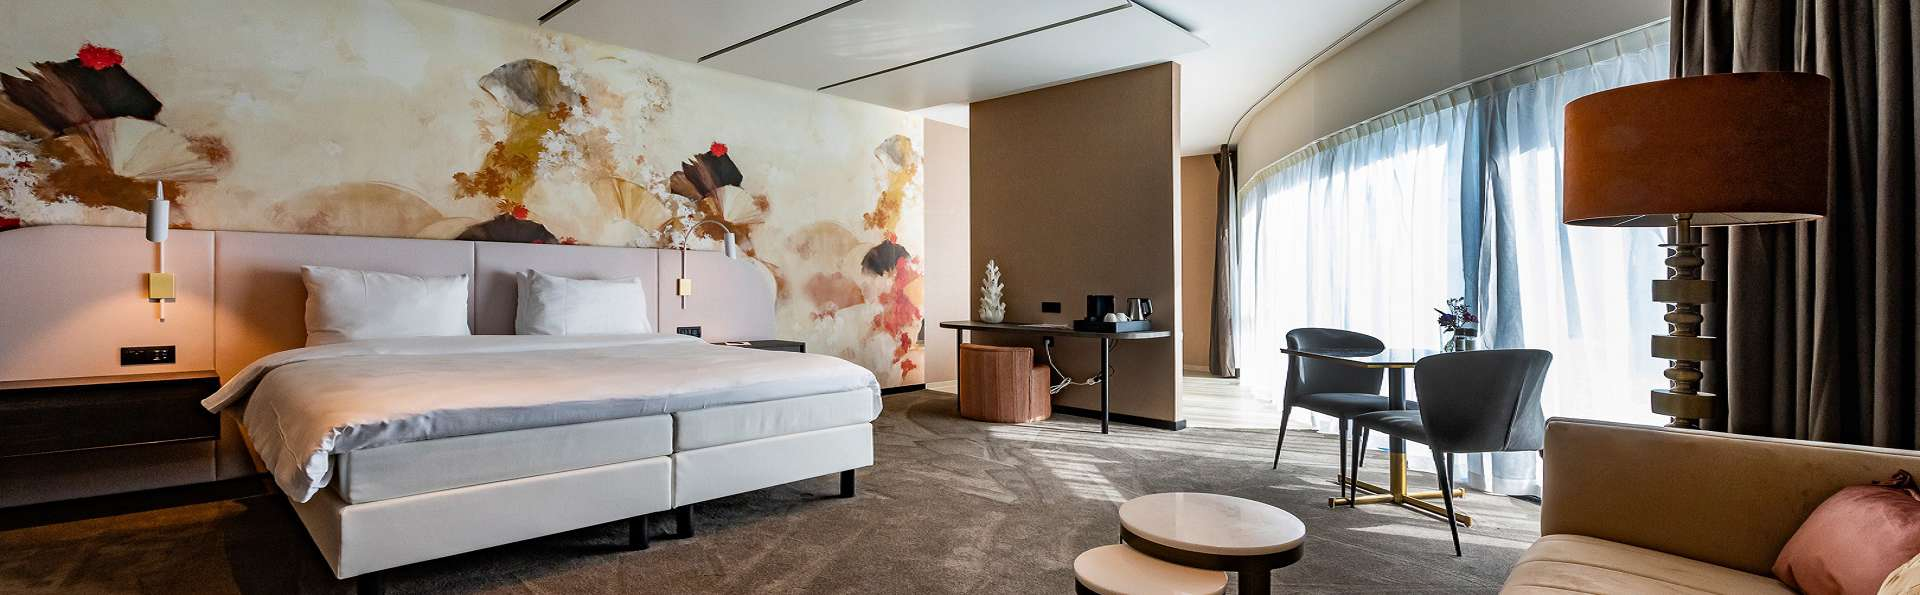 Van der Valk Hotel Gent - foto_7_suite.jpg